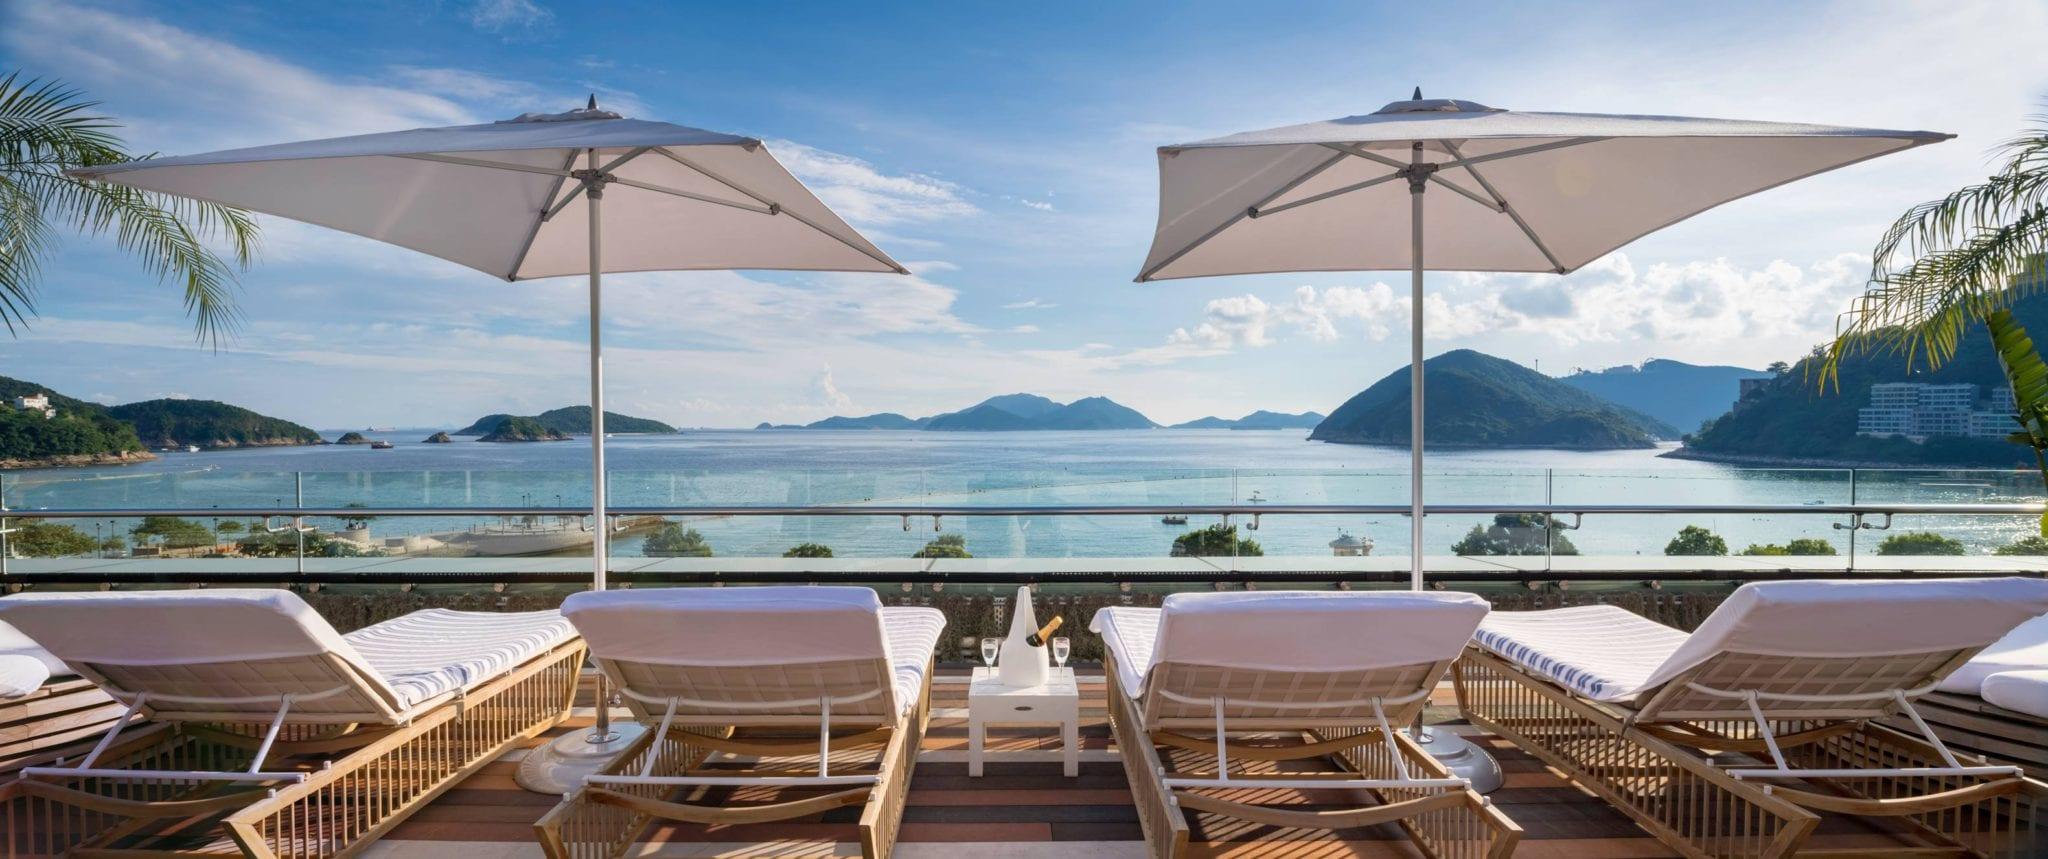 spiaggia, hong kong, bar, spiaggia privata